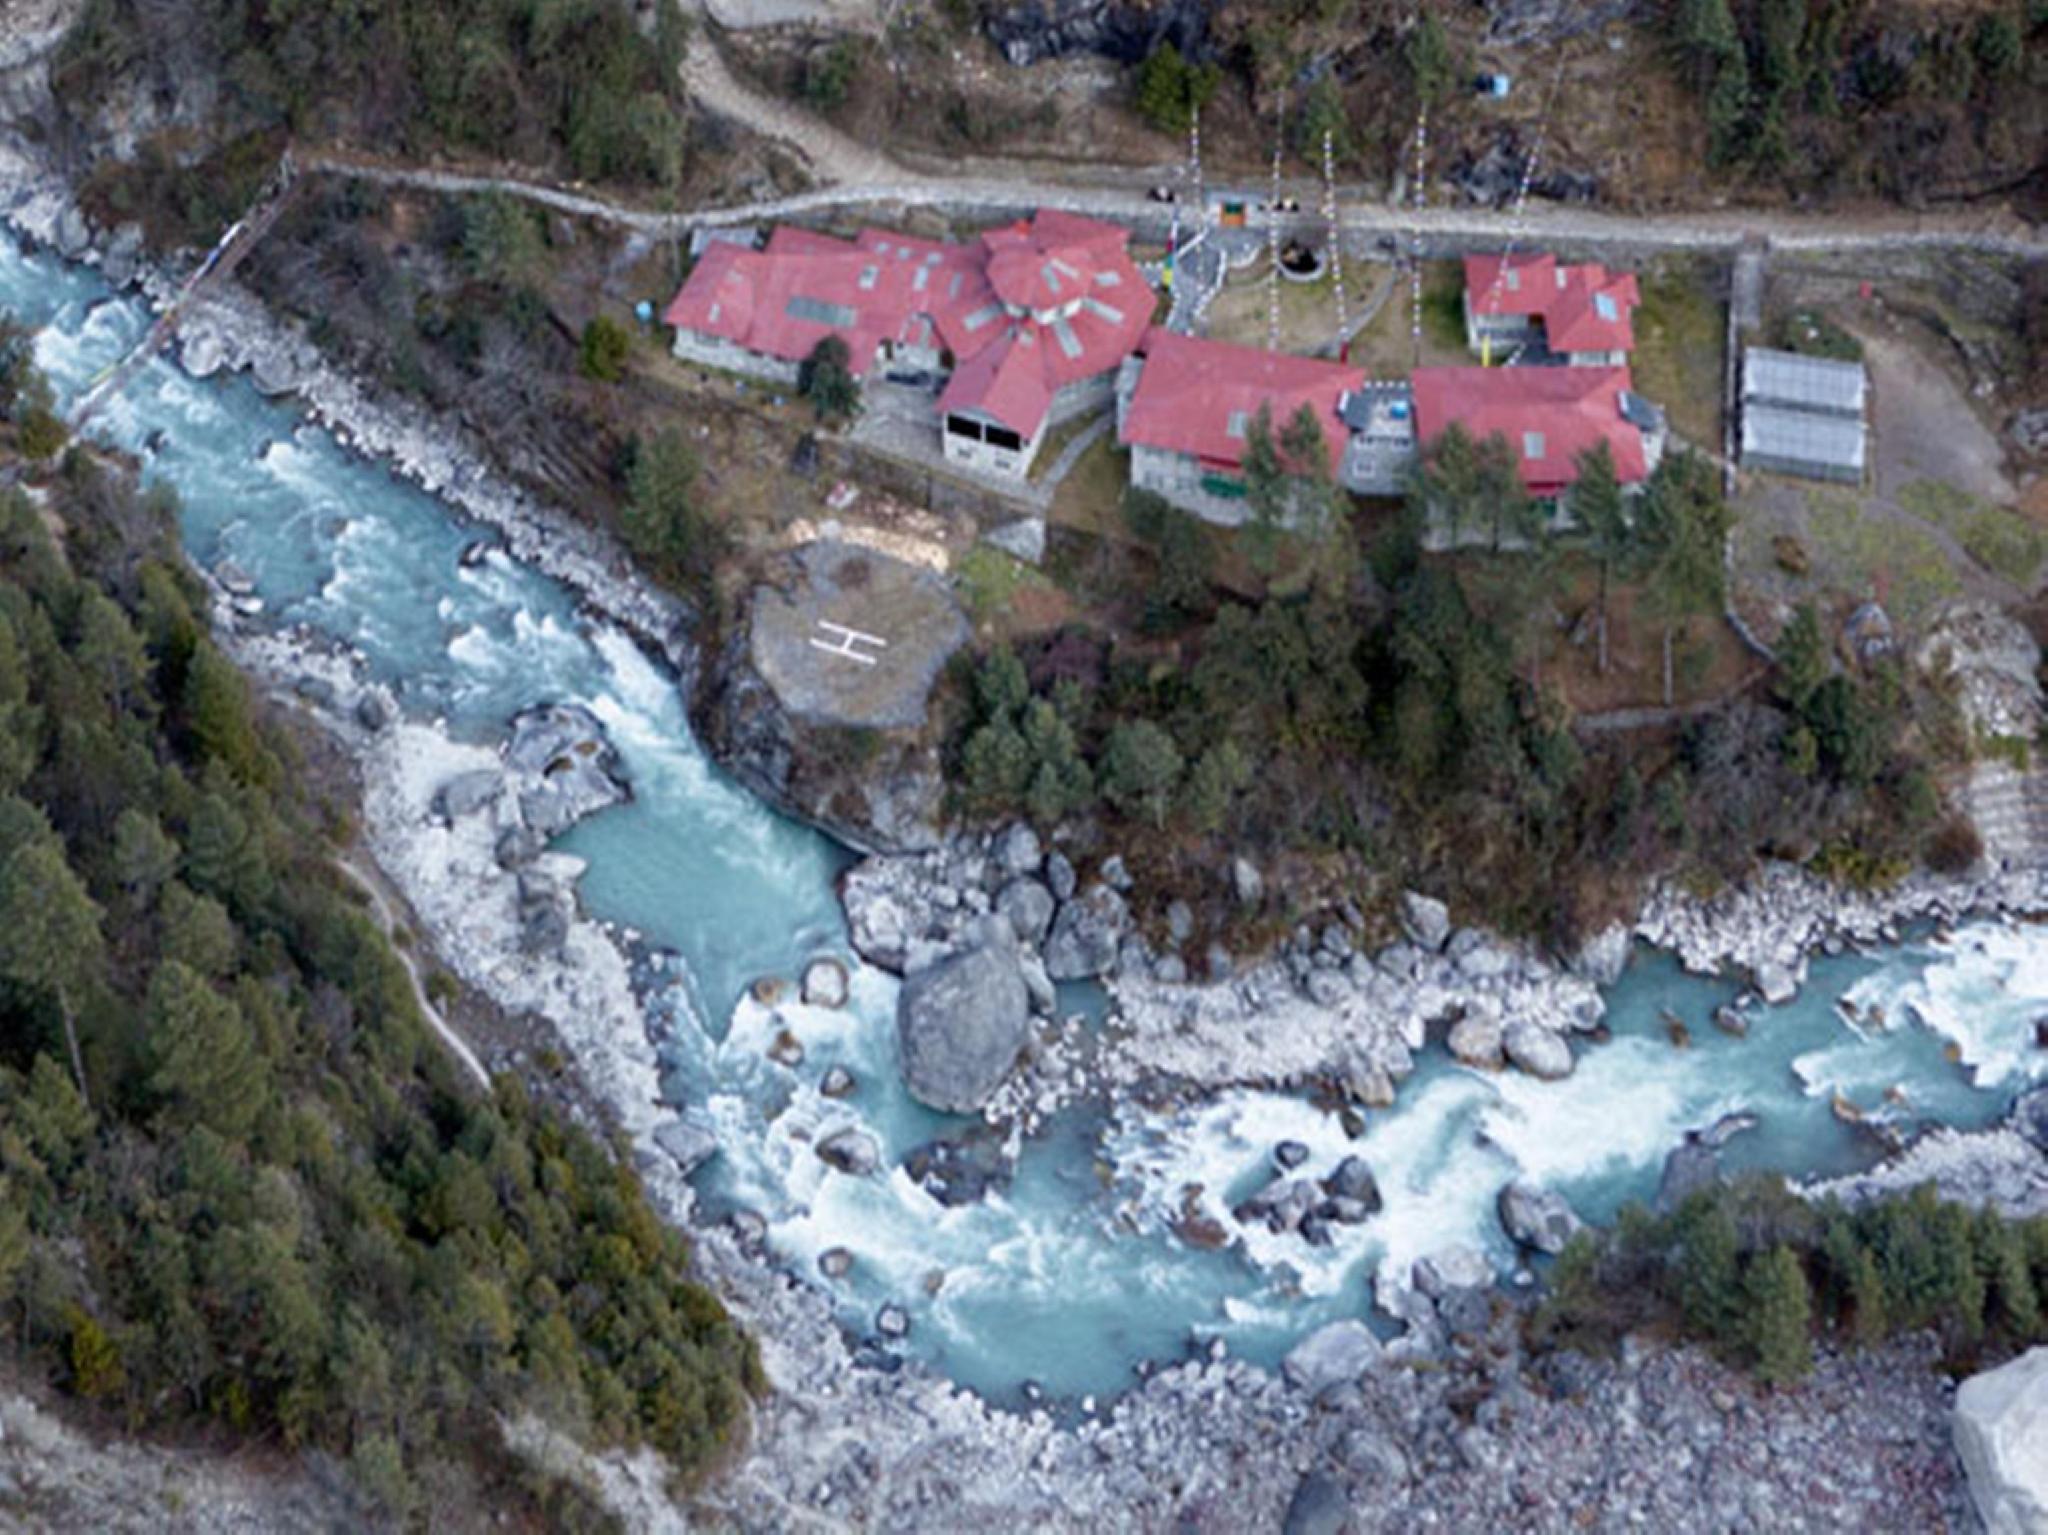 Yeti Mountain Home Phakding, Sagarmatha